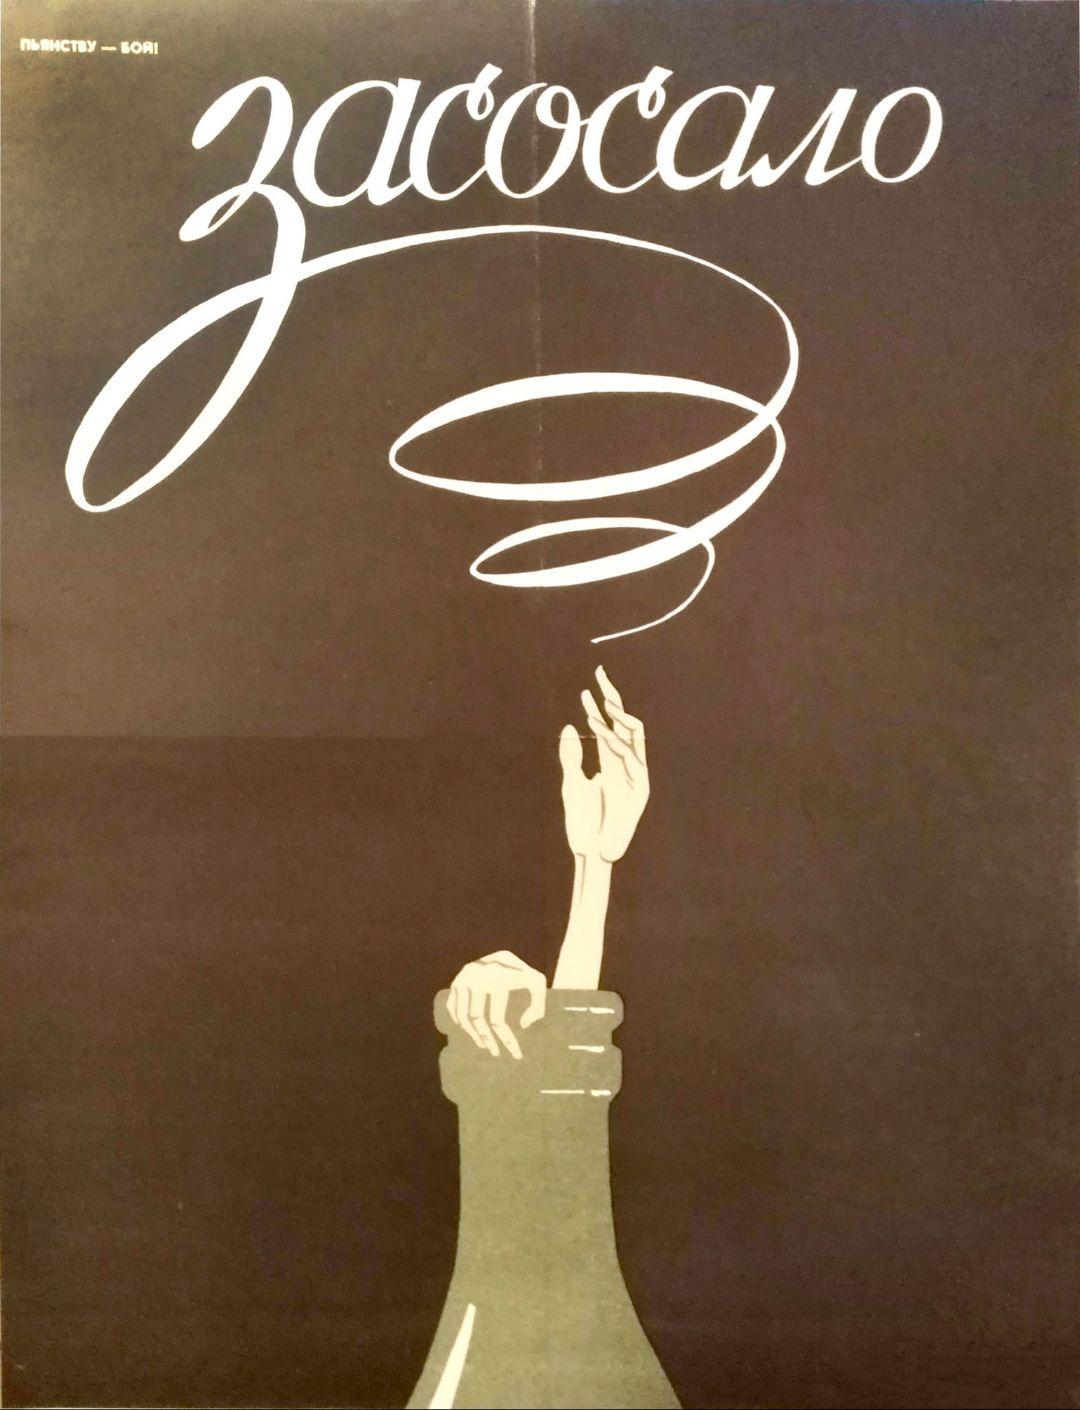 Плакат. Засосало. 1987 г.